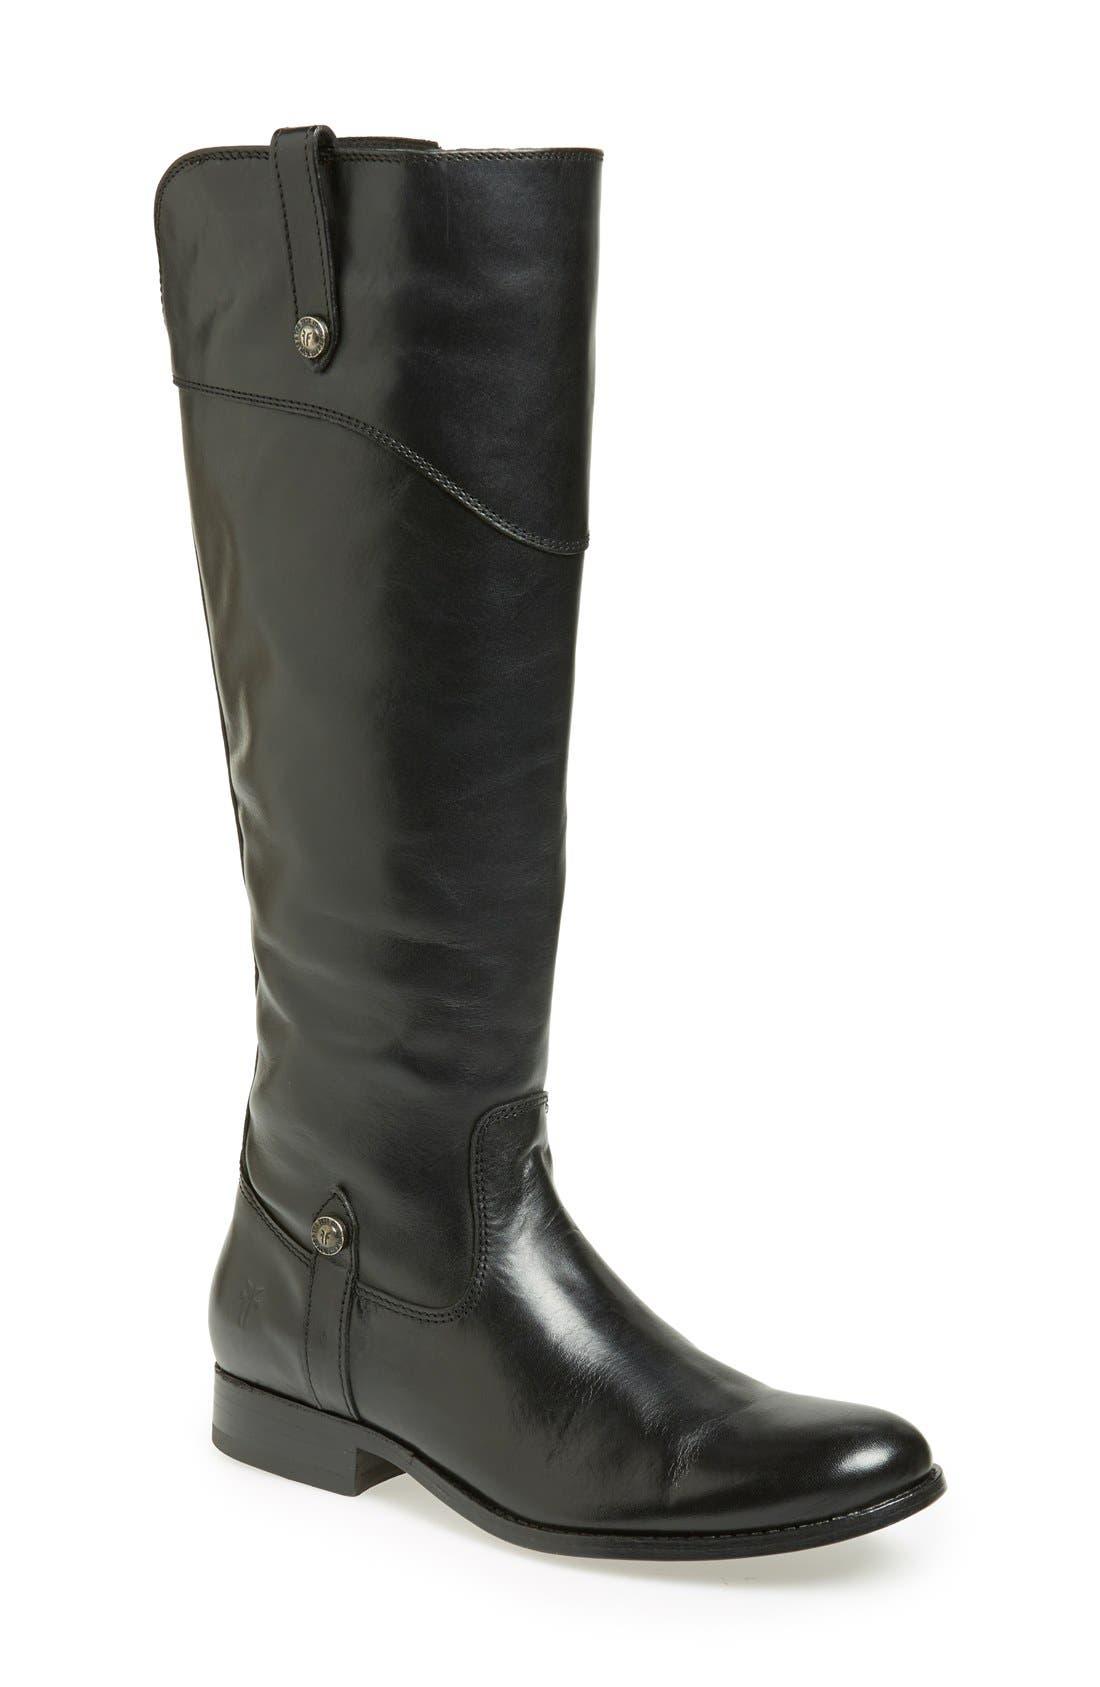 Main Image - Frye 'Melissa Tab' Knee High Boot (Women)